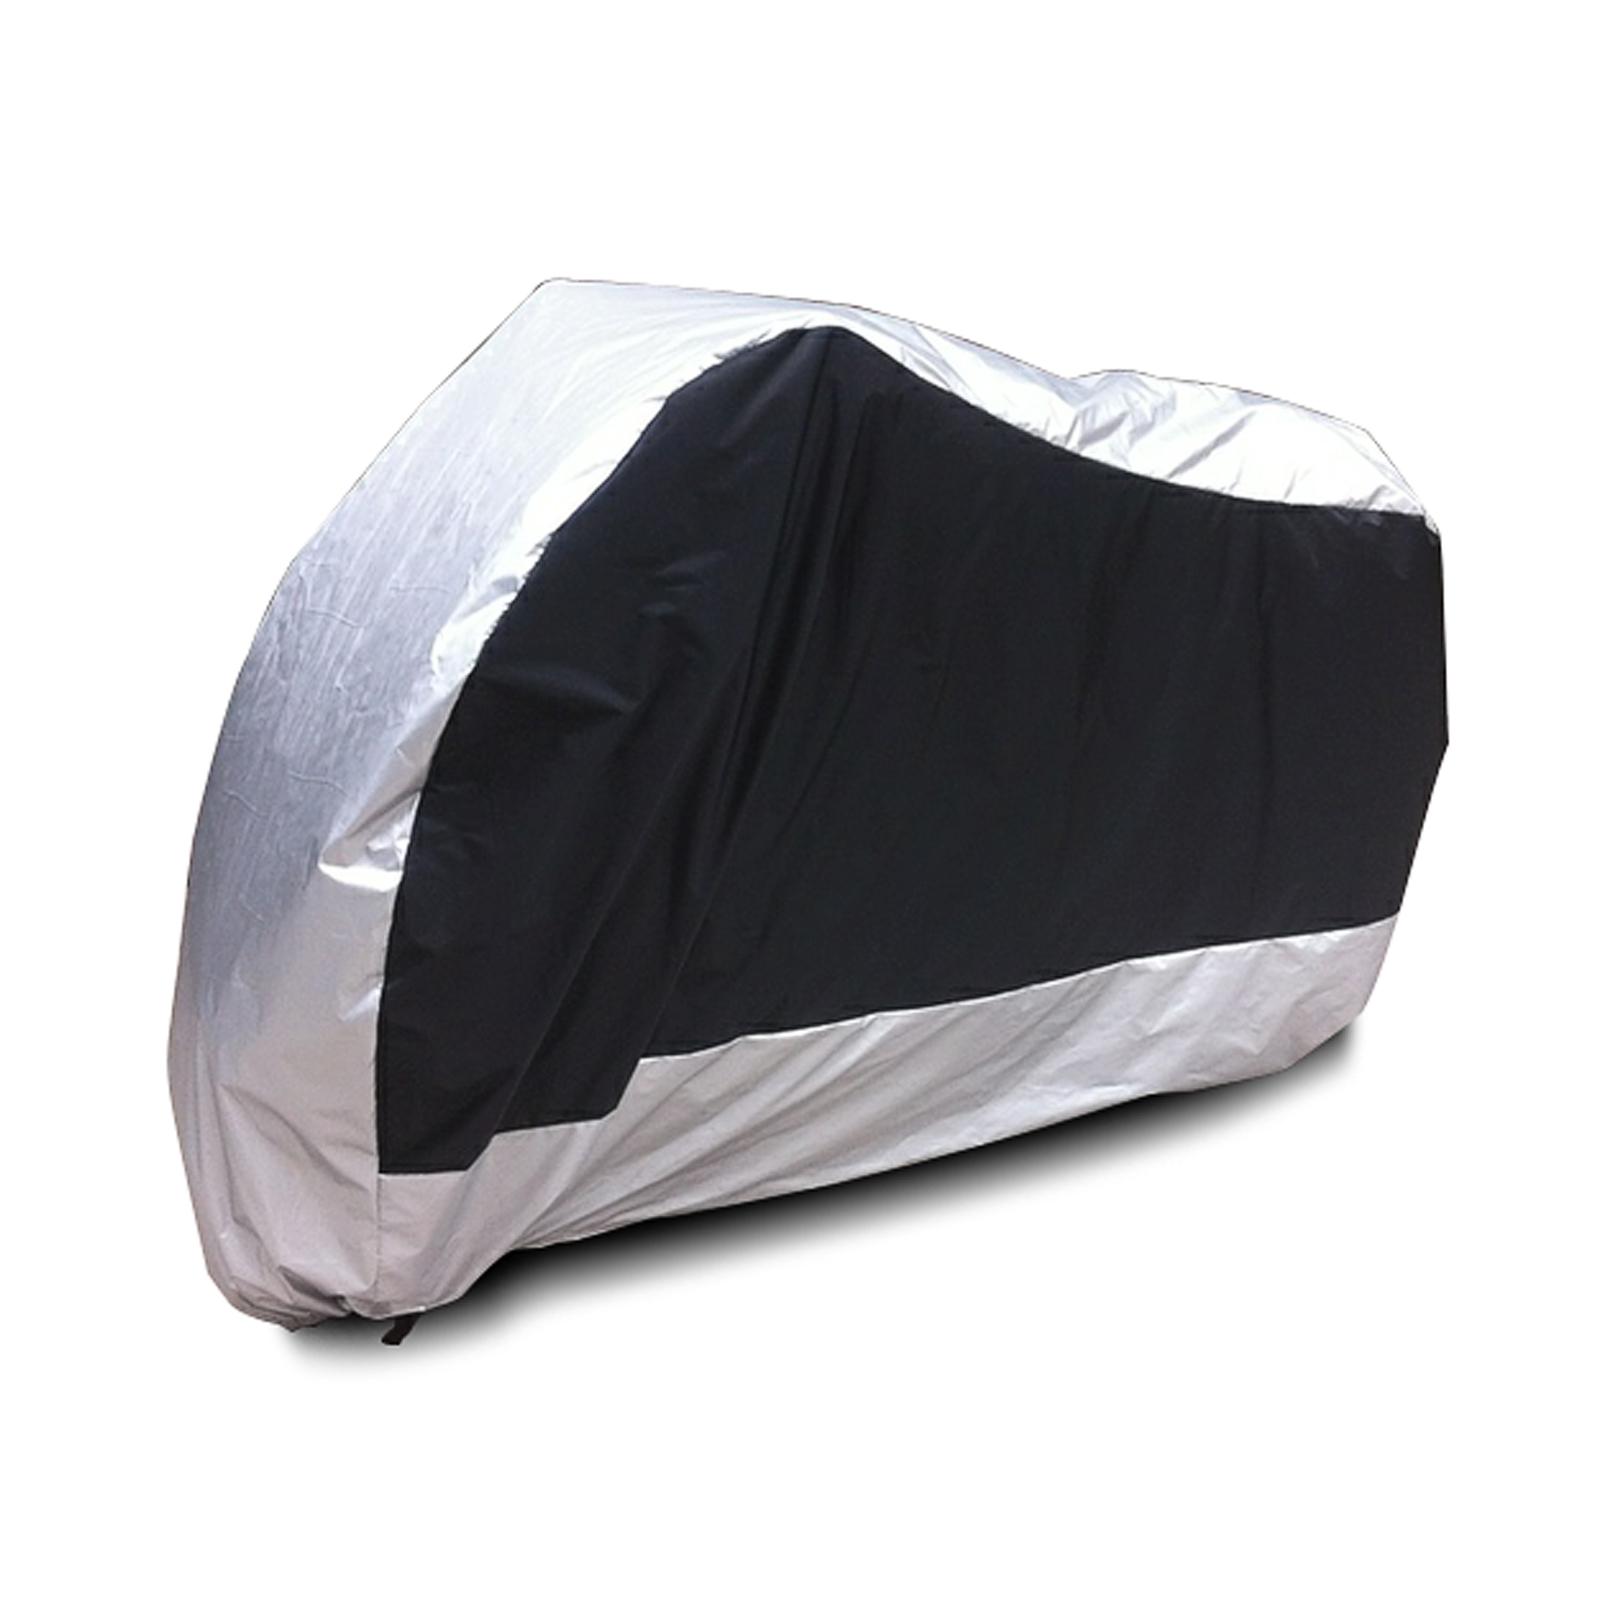 motorrad abdeckplane gr xl ganzgarage faltgarage rollerabdeckung ebay. Black Bedroom Furniture Sets. Home Design Ideas